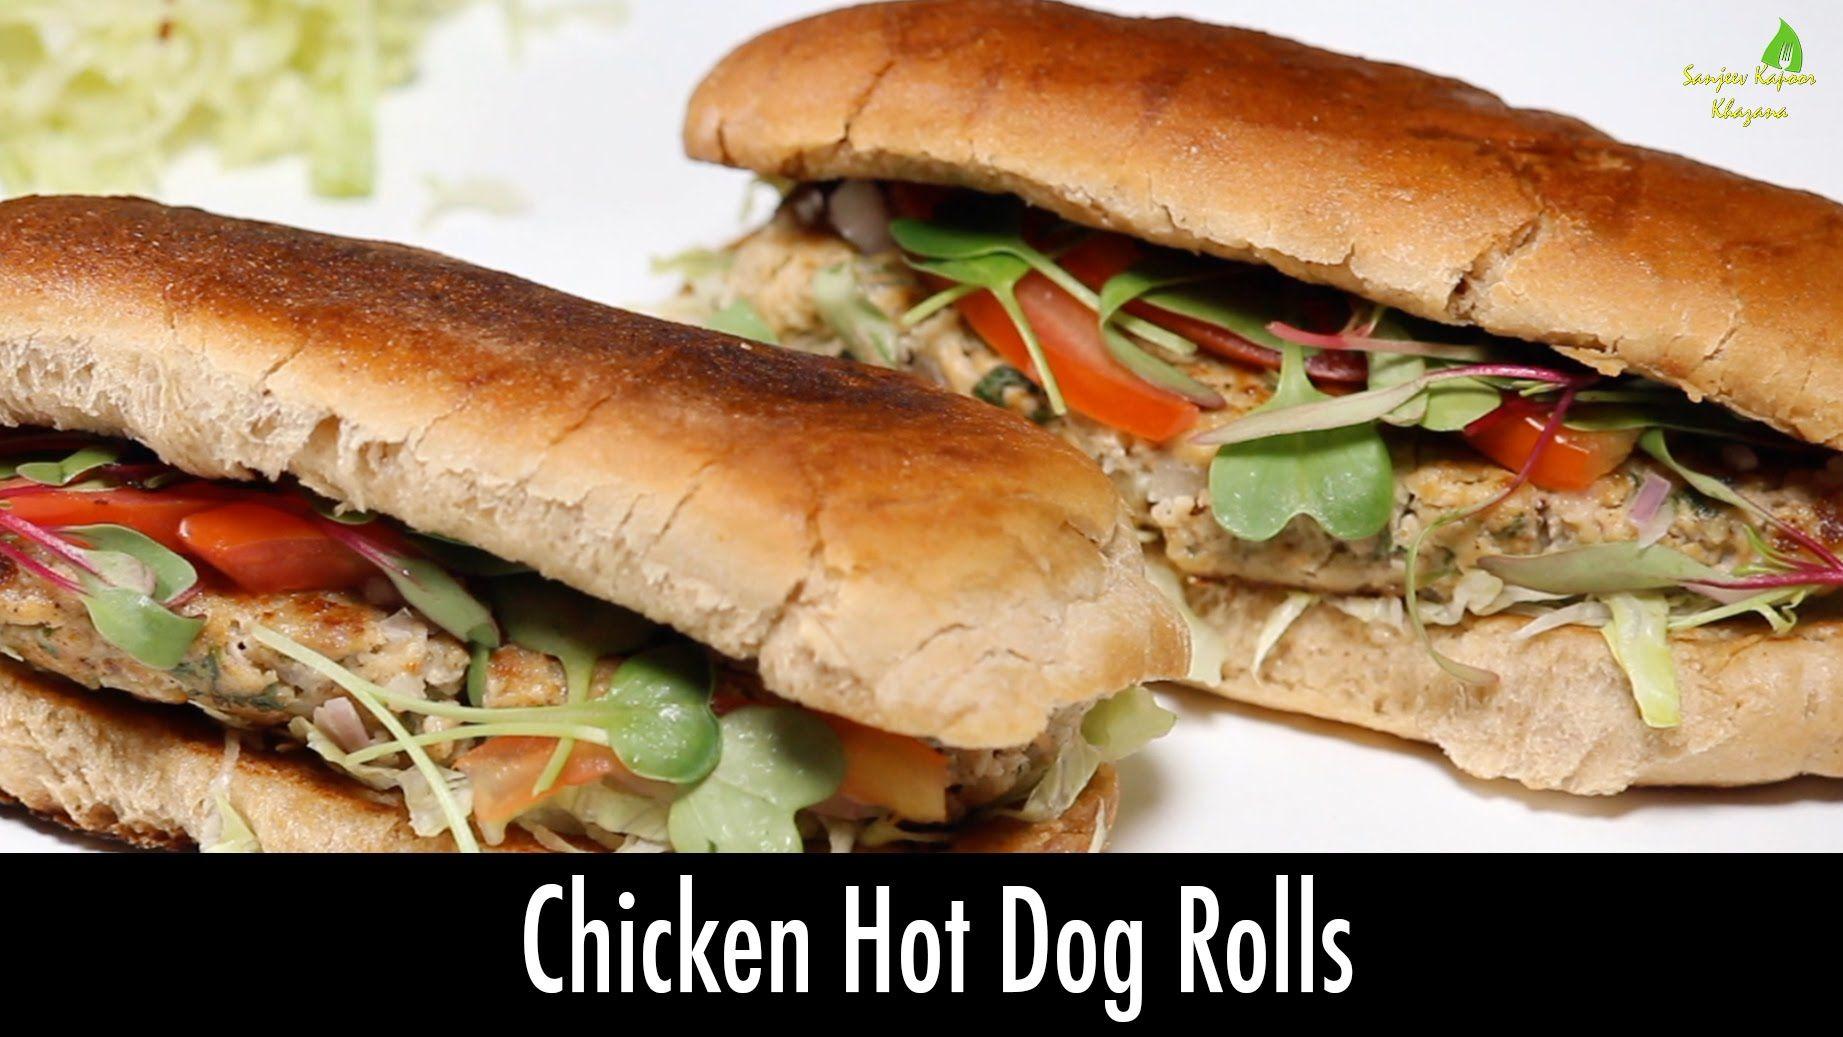 Chicken hotdog rolls sanjeev kapoor khazana breakfast chicken hotdog rolls sanjeev kapoor khazana forumfinder Choice Image